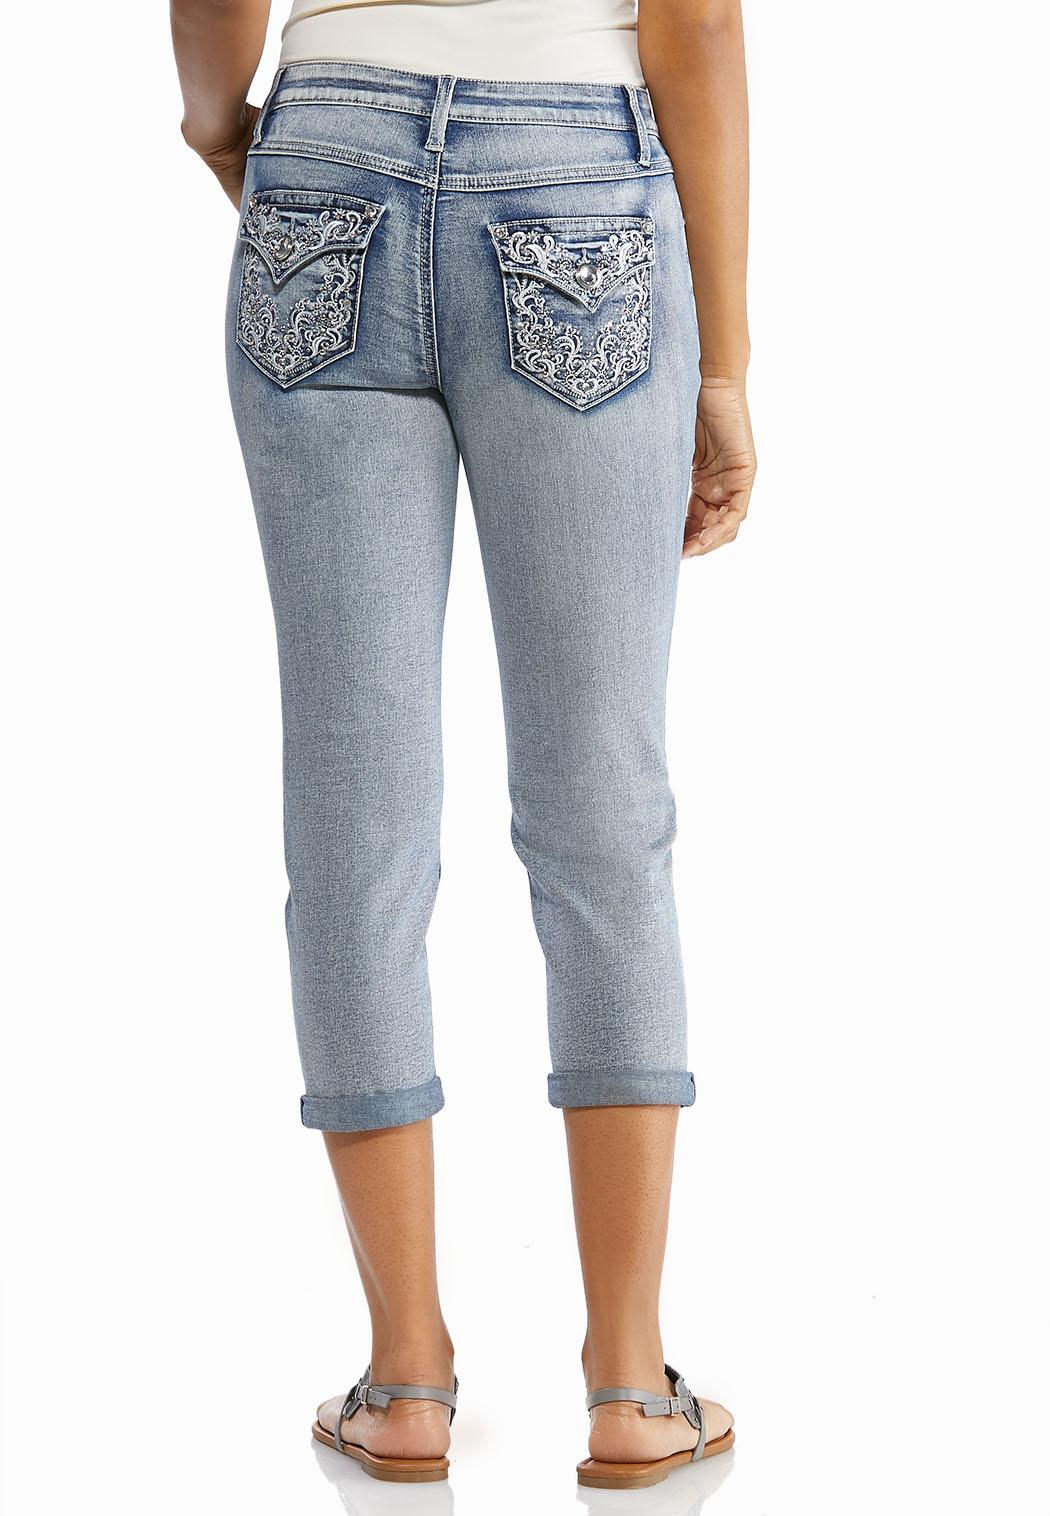 Cropped Rhinestone Embellished Jeans